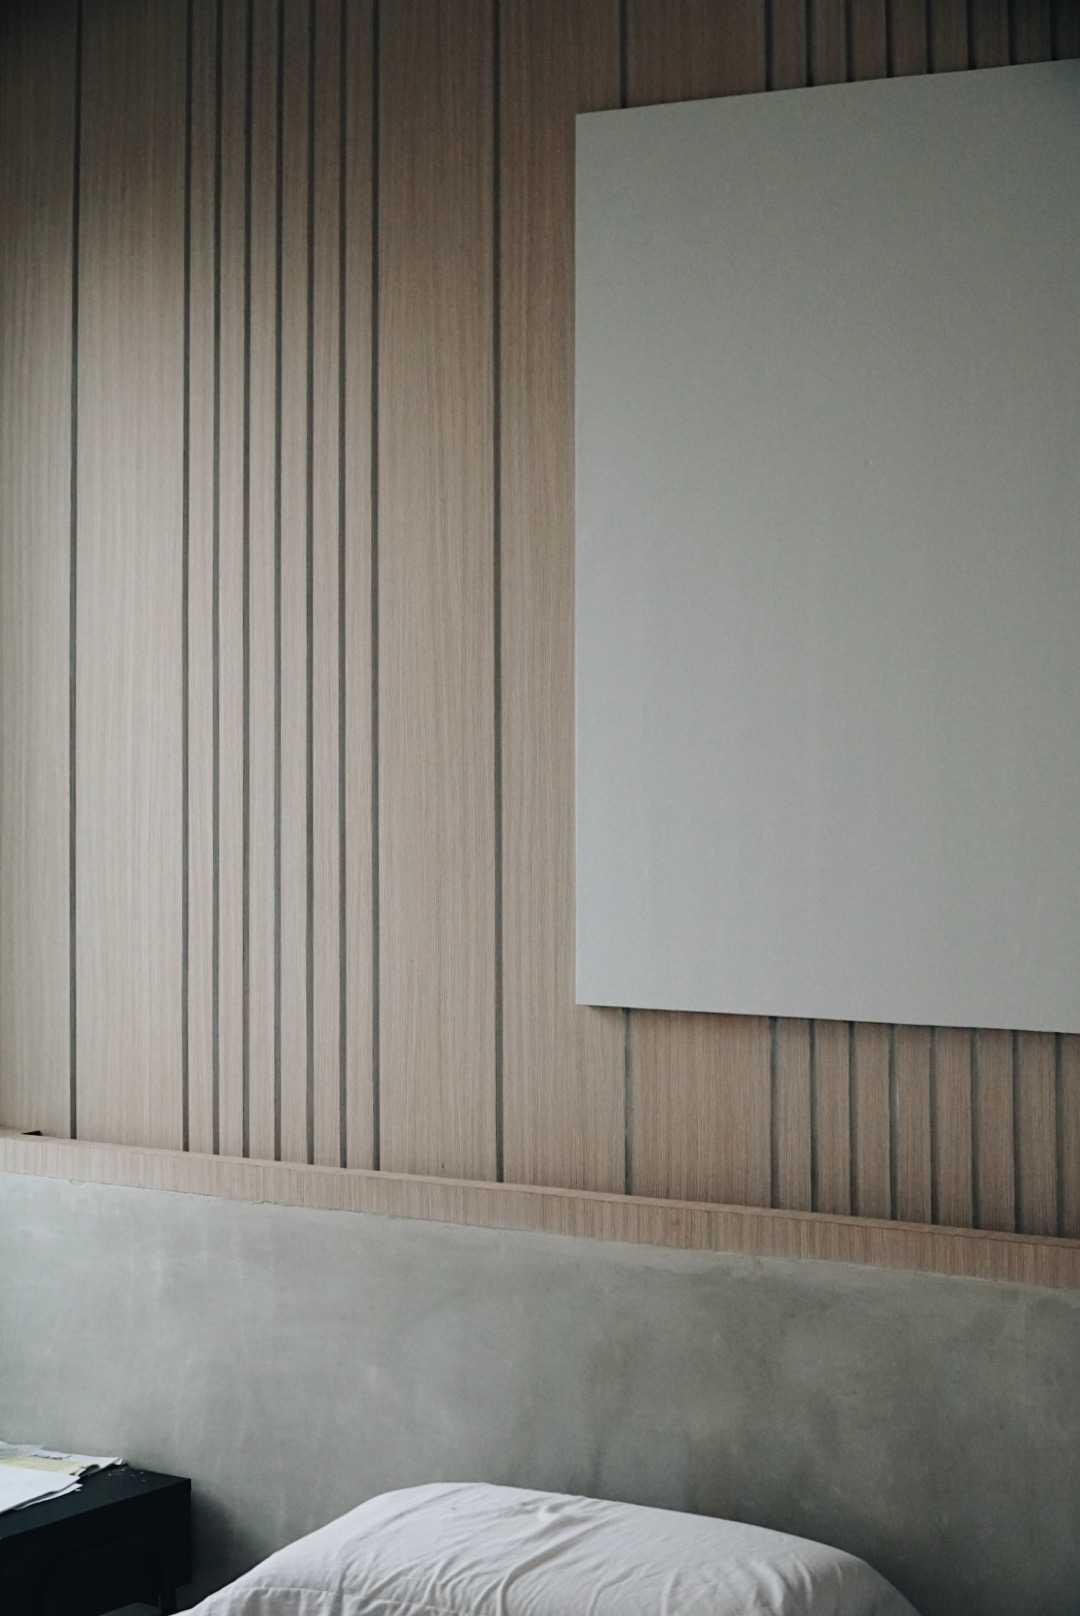 Schéma Project Yy House Sinar Mas Land Plaza, Jl. Bsd Green Boulevard Barat Kav. Office Park No. 1, Sampora, Tangerang, Banten 15157, Indonesia Sinar Mas Land Plaza, Jl. Bsd Green Boulevard Barat Kav. Office Park No. 1, Sampora, Tangerang, Banten 15157, Indonesia Schma-Project-Yy-House  111903